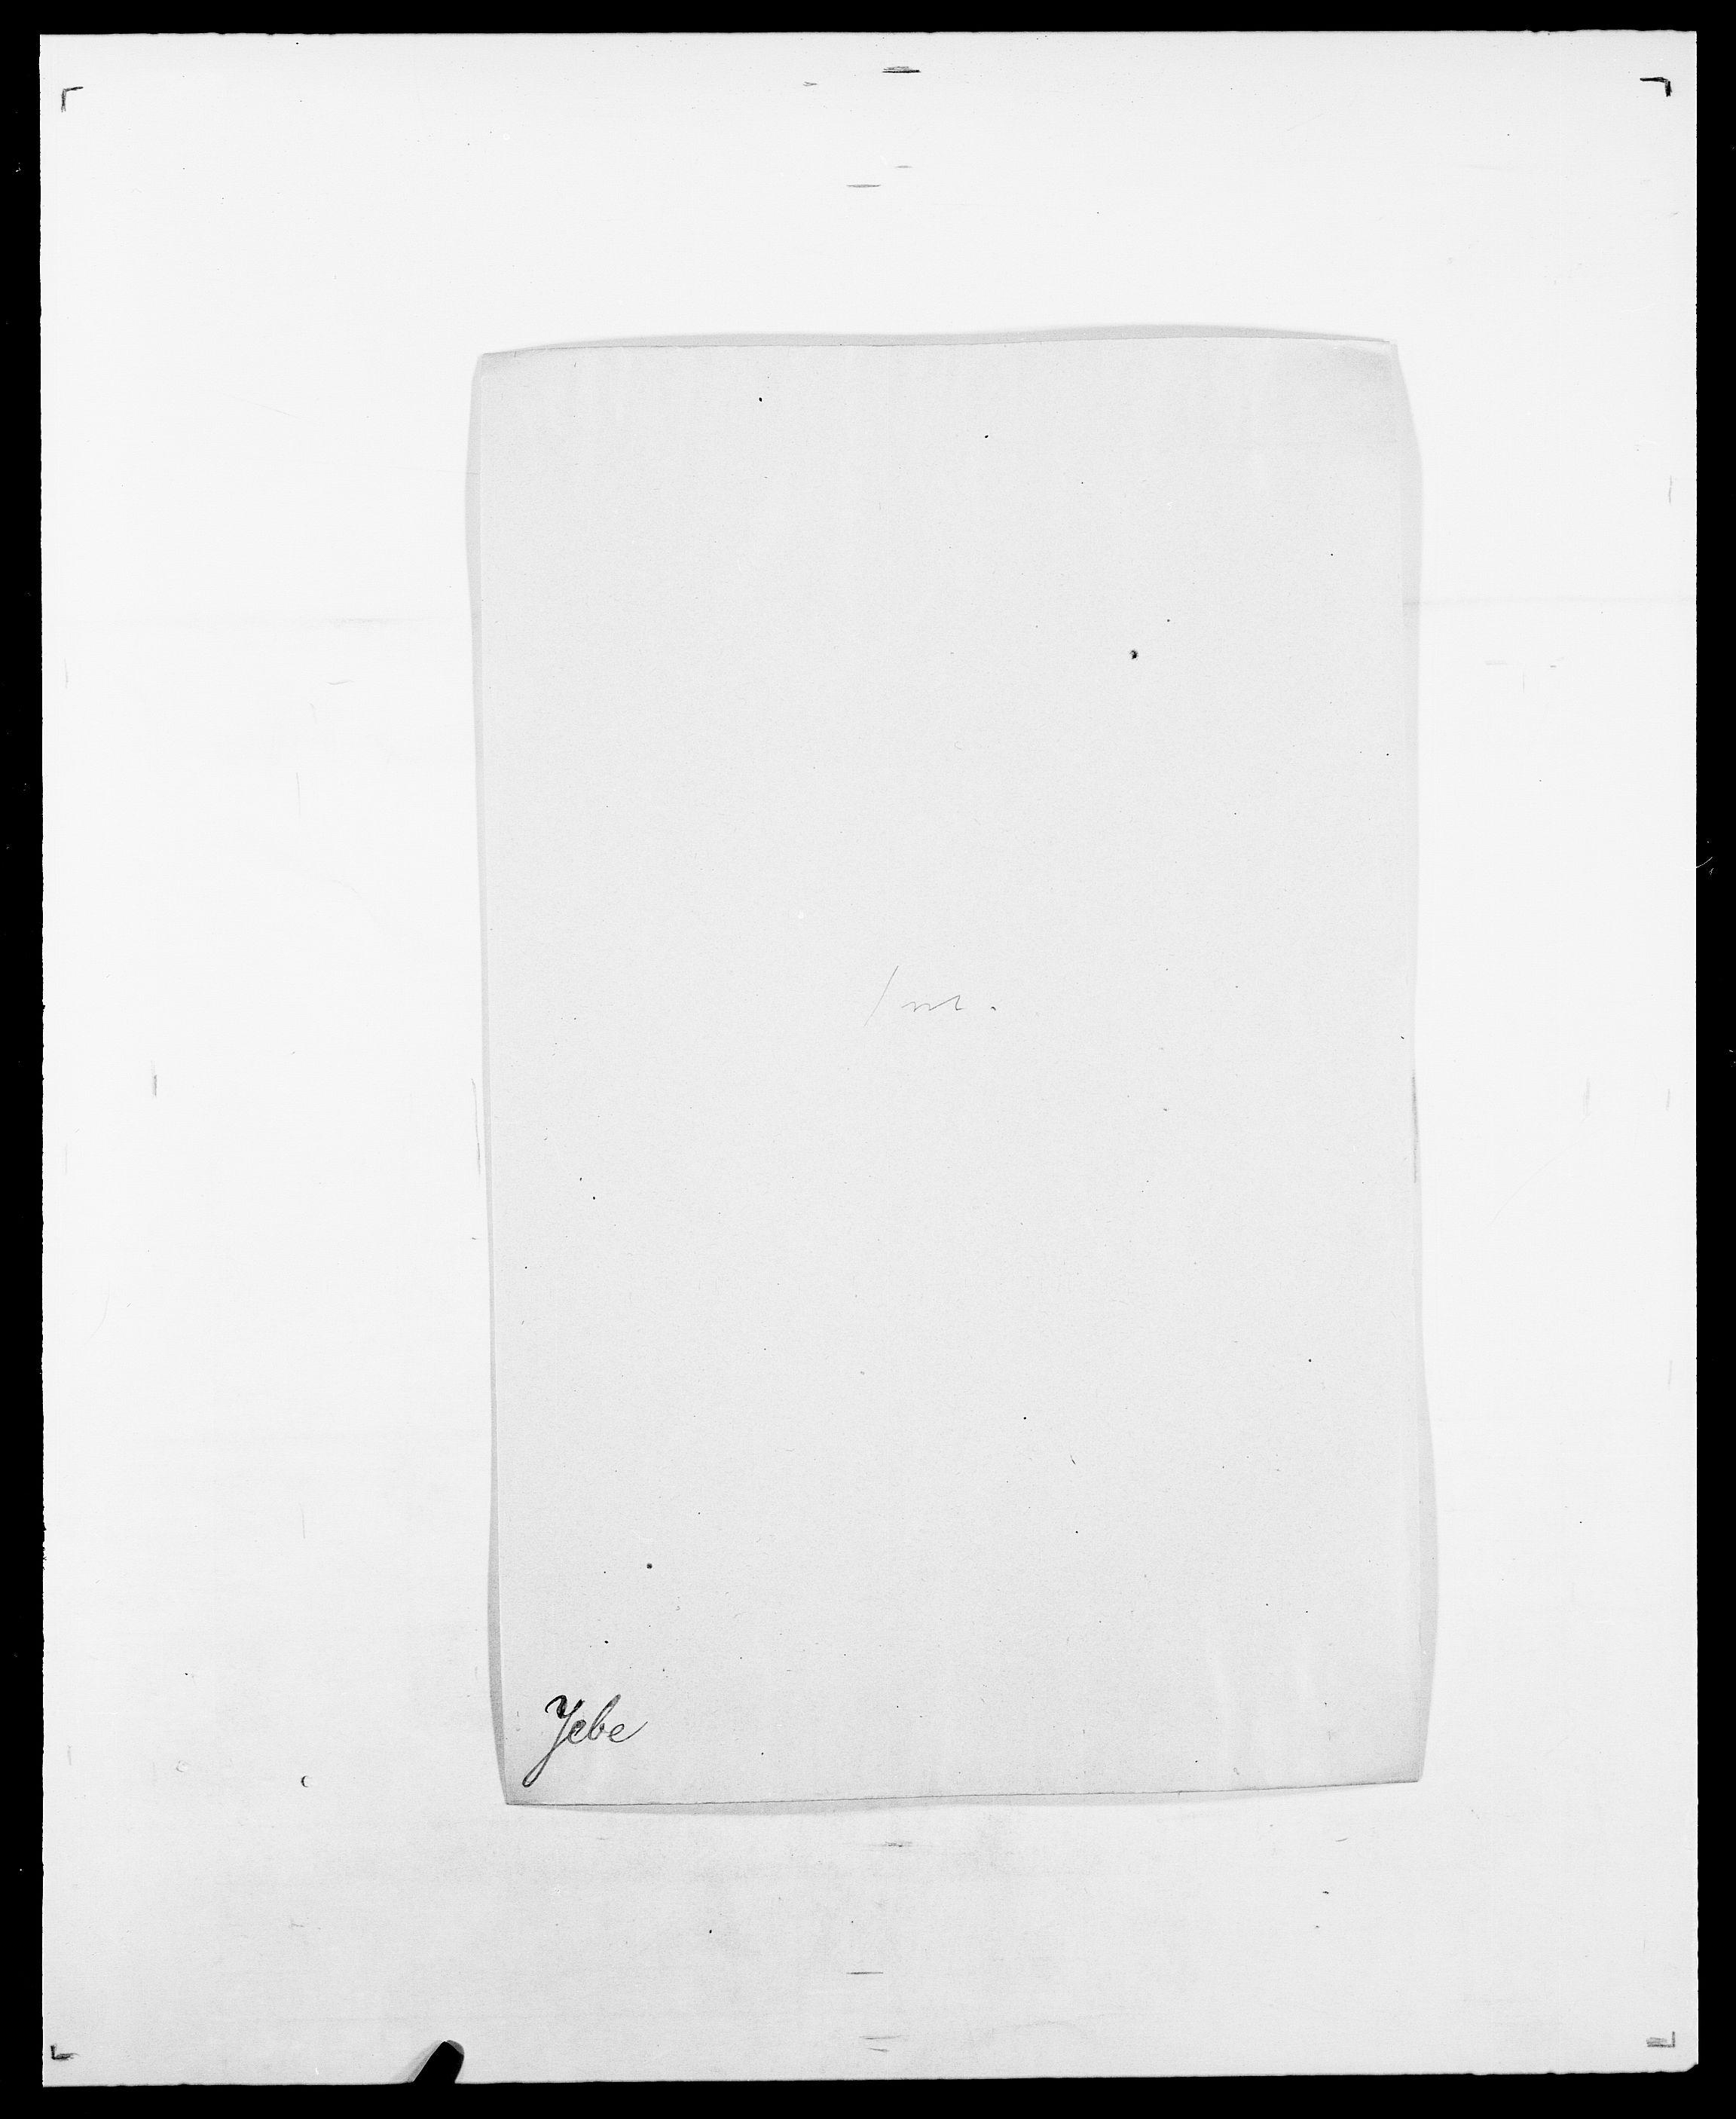 SAO, Delgobe, Charles Antoine - samling, D/Da/L0019: van der Hude - Joys, s. 614